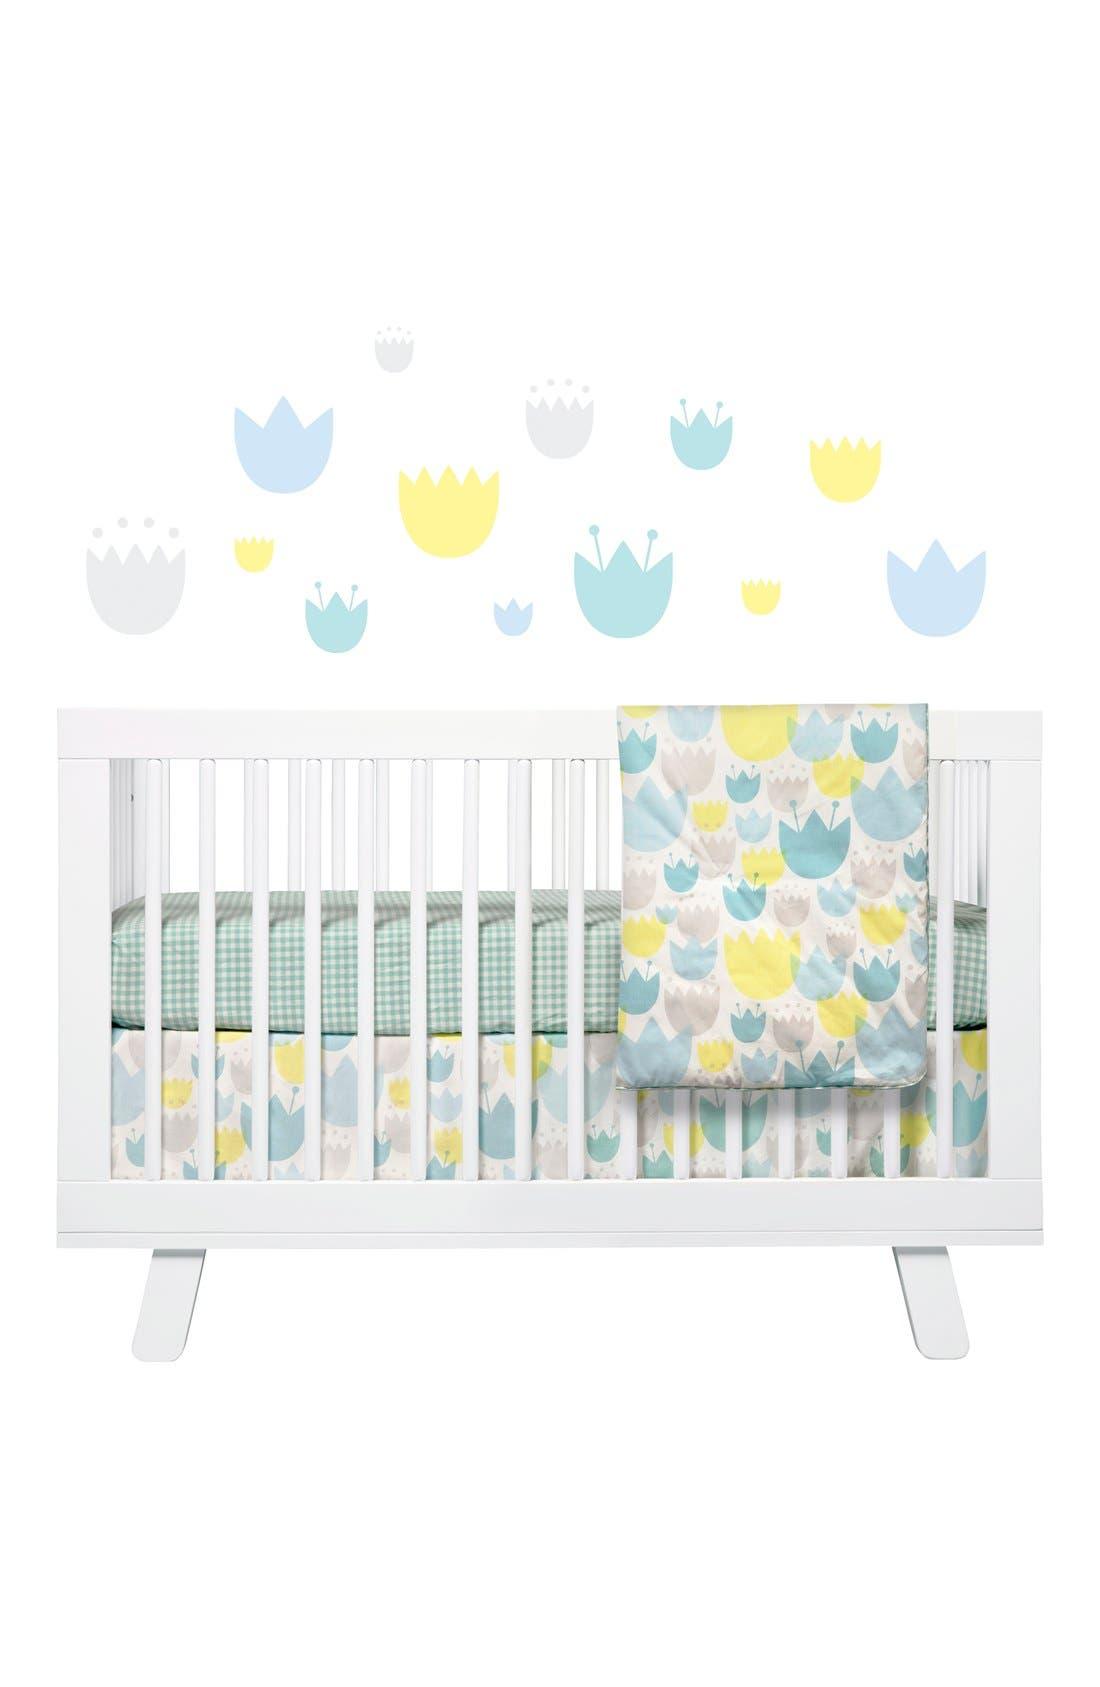 'Garden' Crib Sheet, Crib Skirt, Stroller Blanket & Wall Decals,                         Main,                         color, Blue